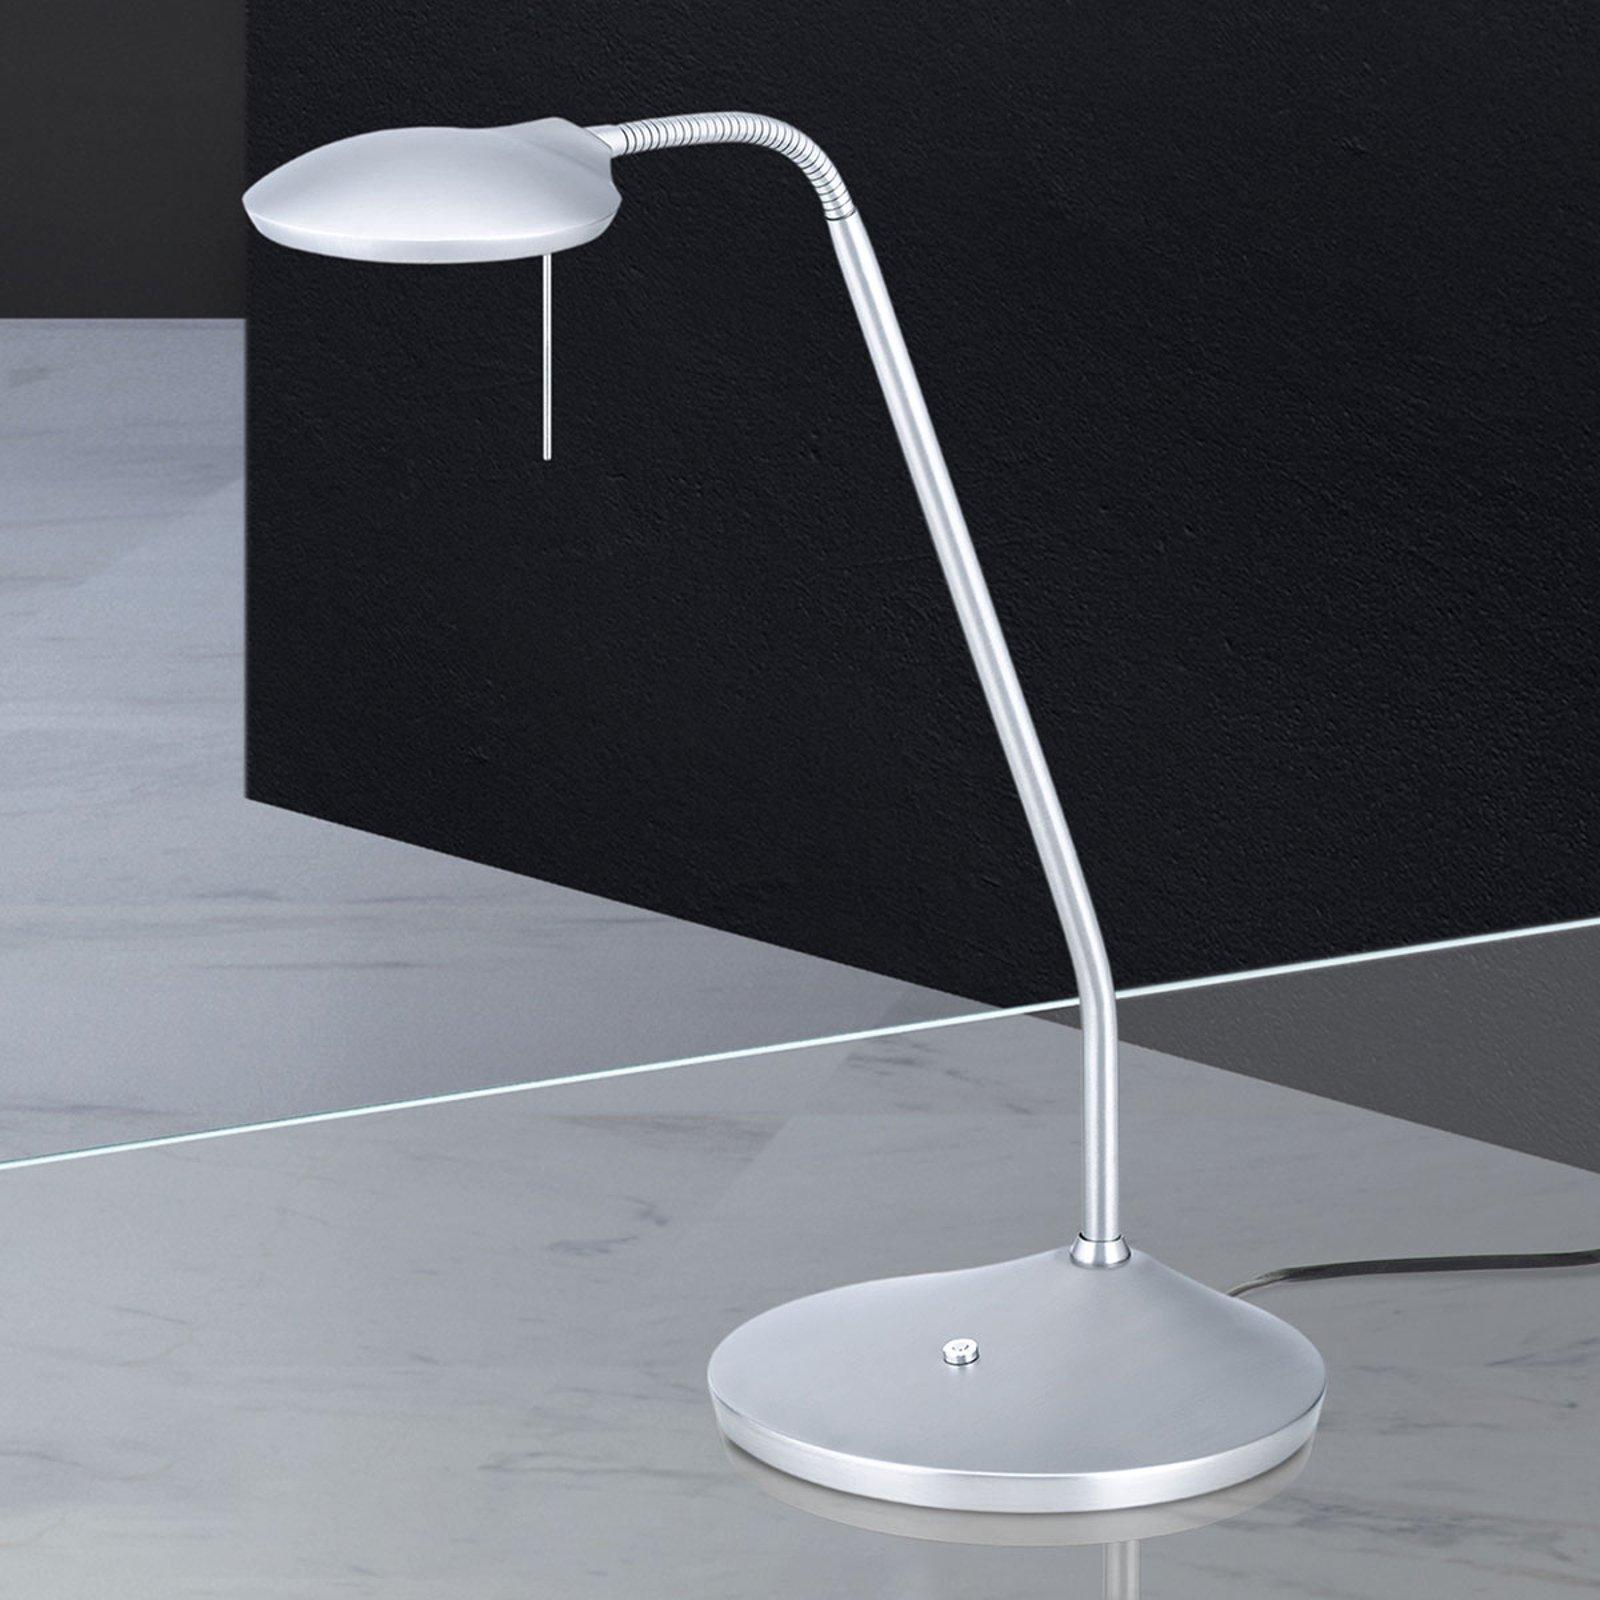 LED-bordlampe Cobra, justerbar lysfarge